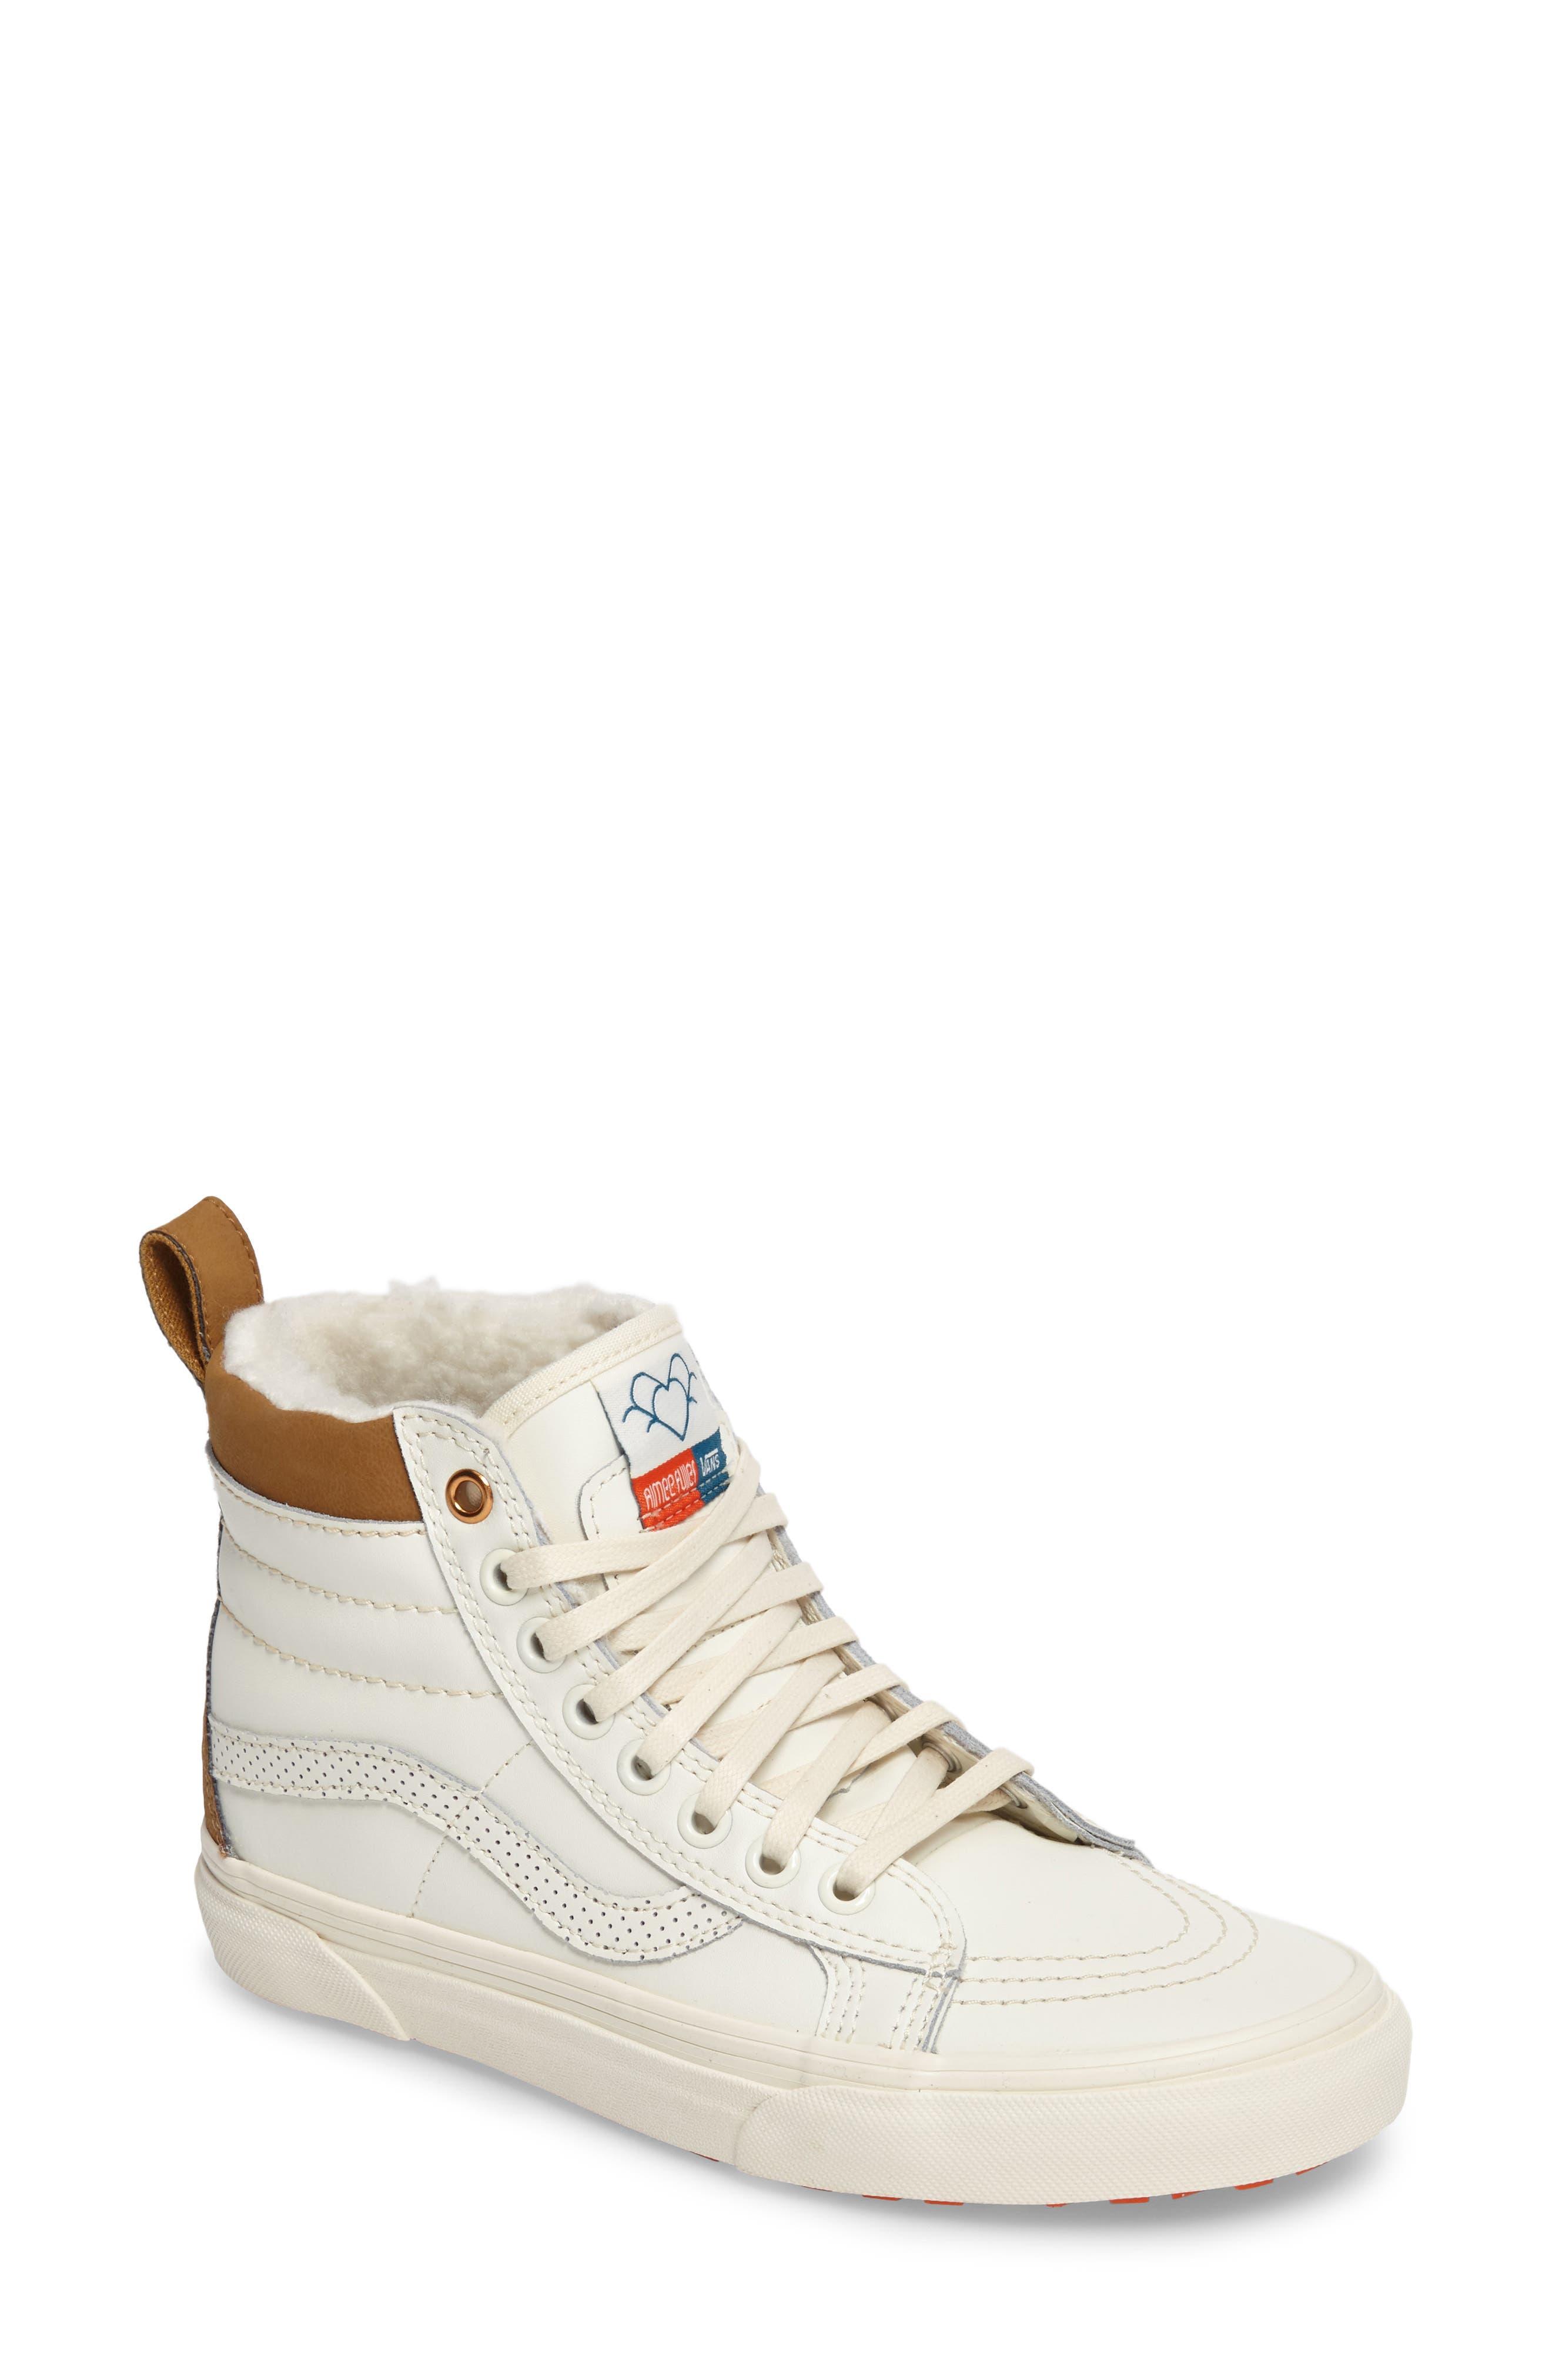 Main Image - Vans Sk-8 Hi MTE Sneaker (Women)